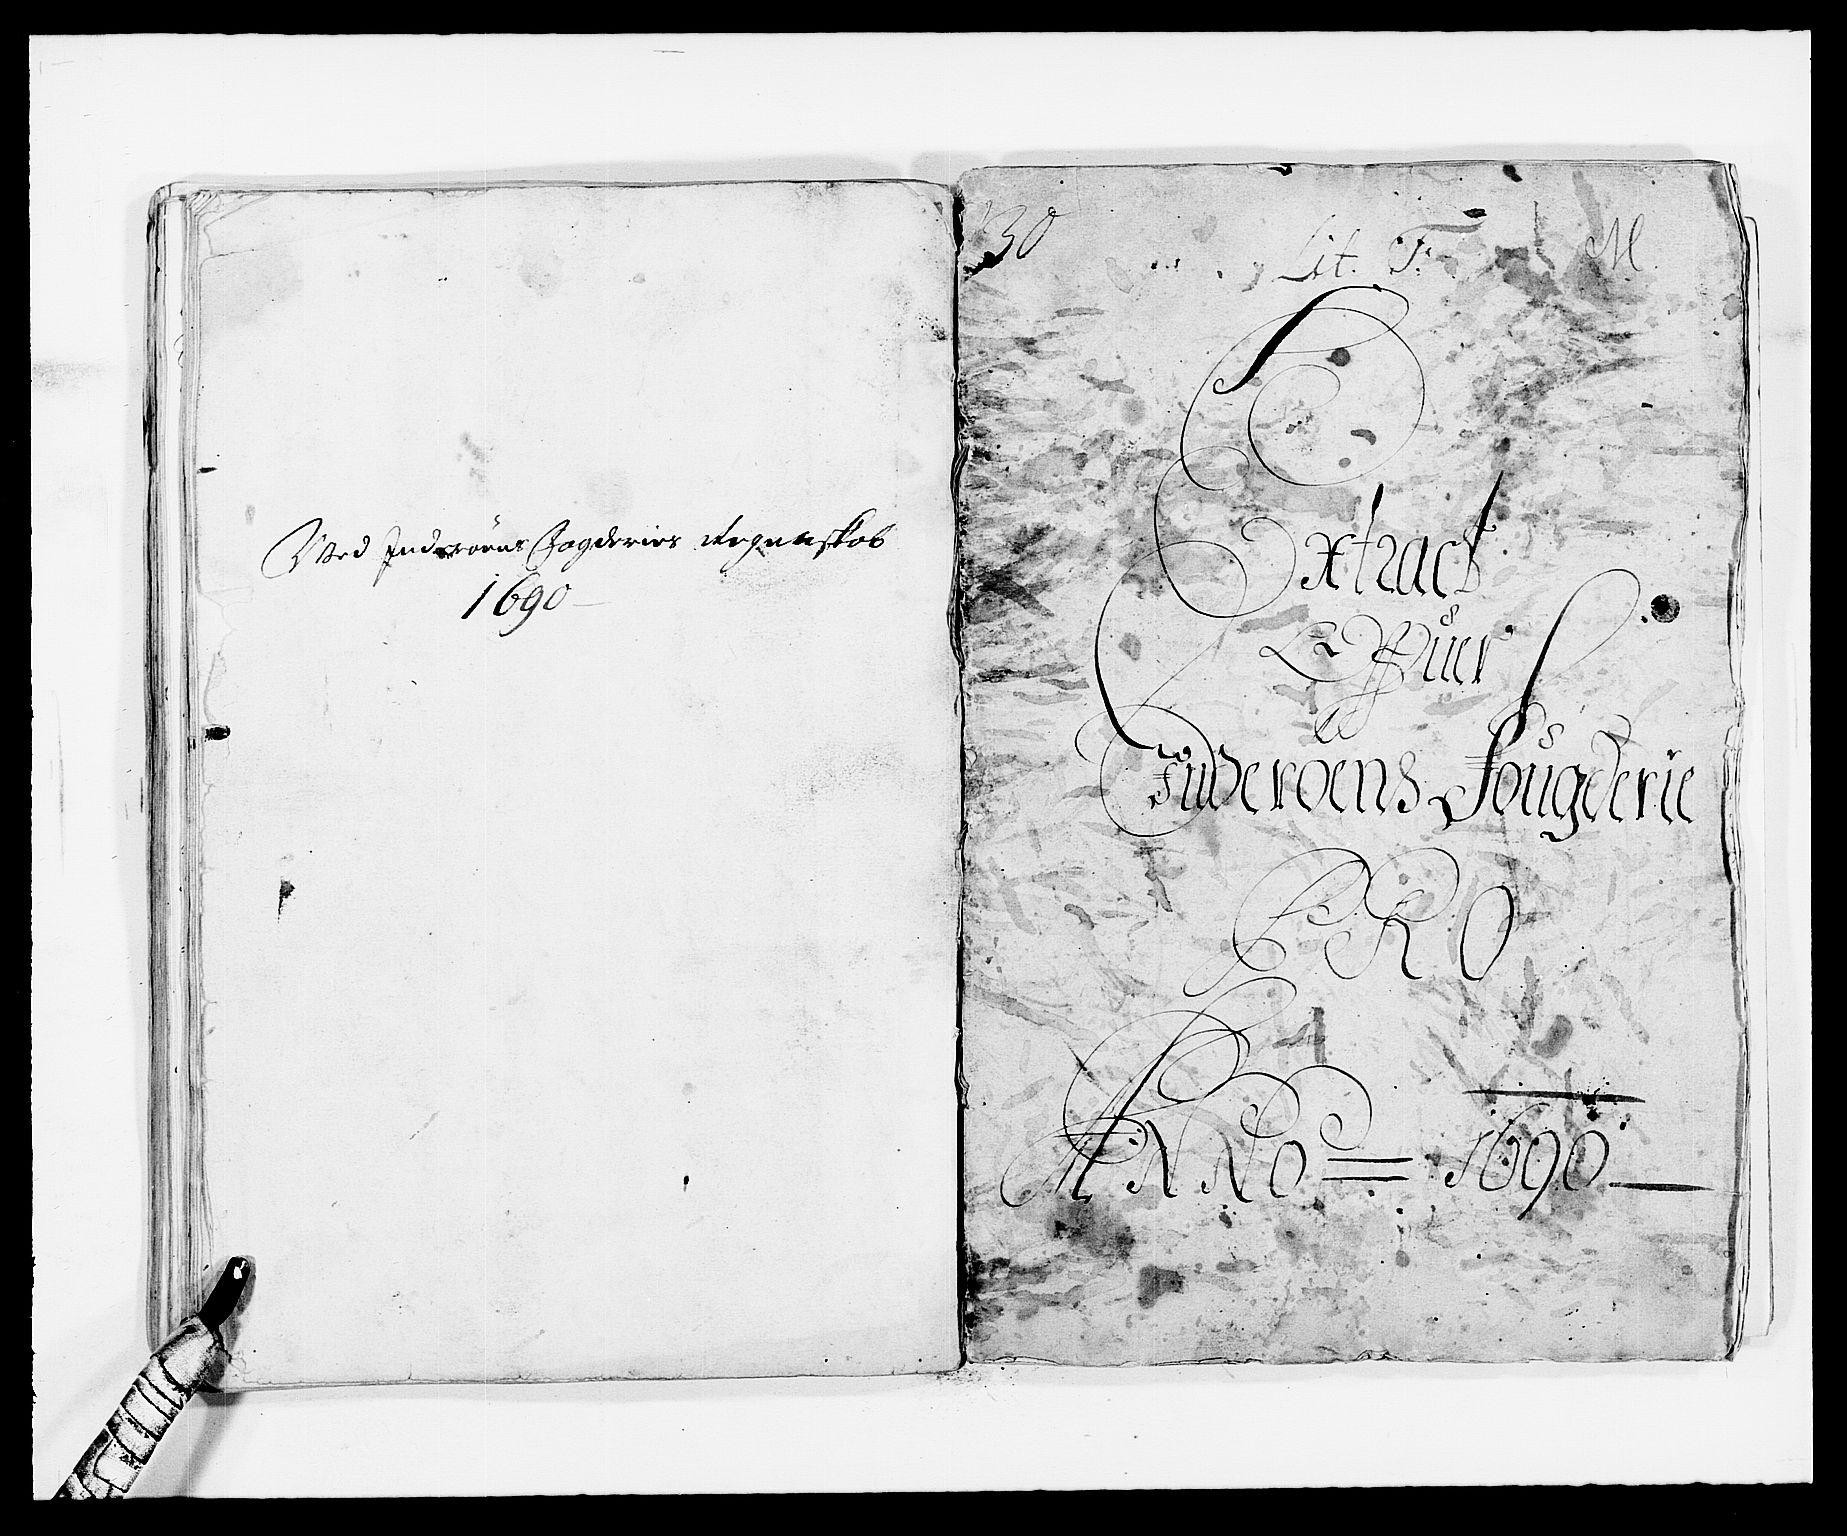 RA, Rentekammeret inntil 1814, Reviderte regnskaper, Fogderegnskap, R63/L4307: Fogderegnskap Inderøy, 1690-1691, s. 3